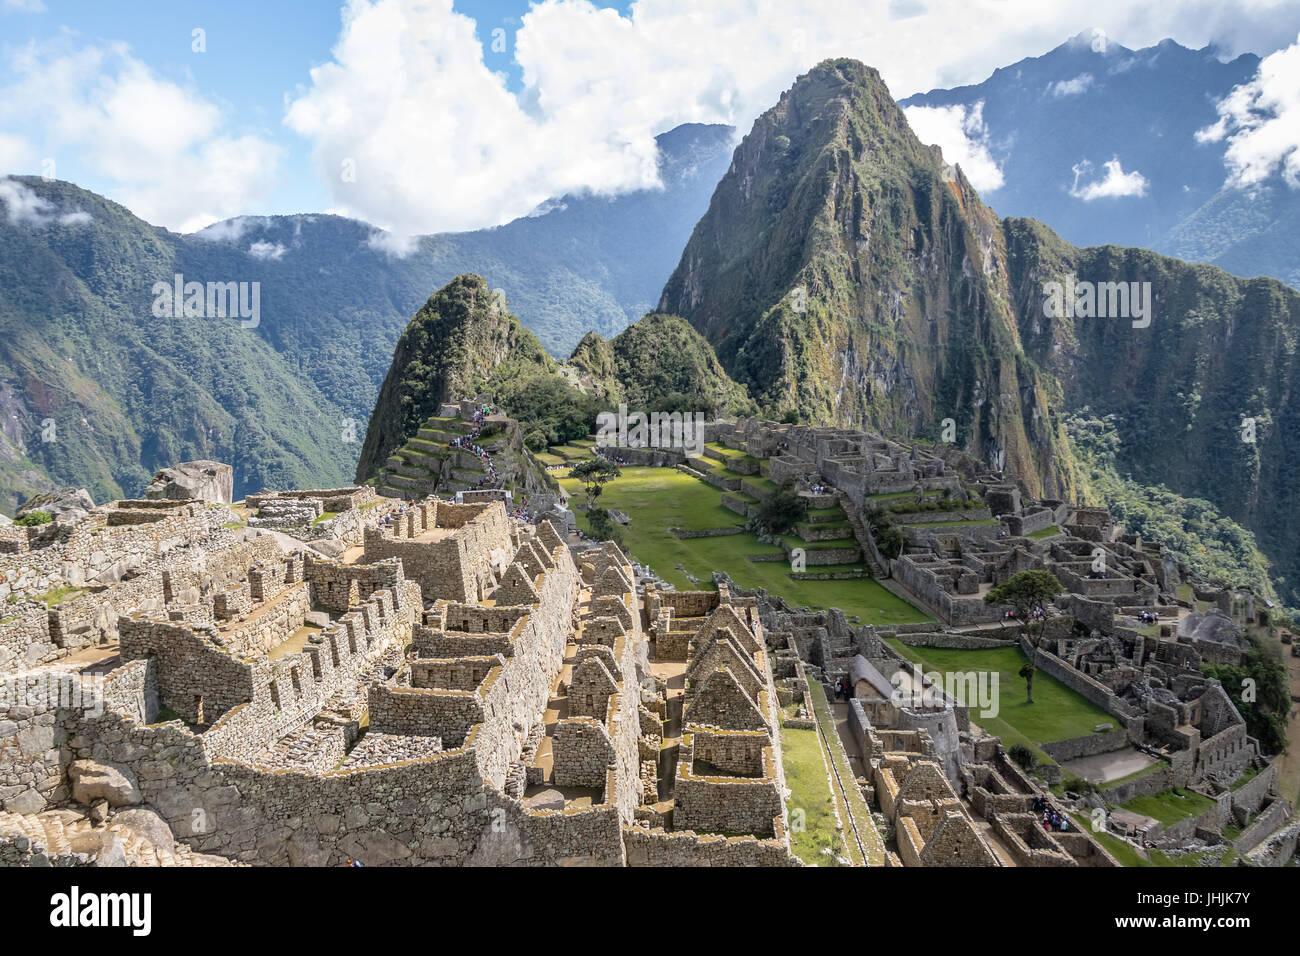 Machu Picchu Inca Ruins - Sacred Valley, Peru - Stock Image